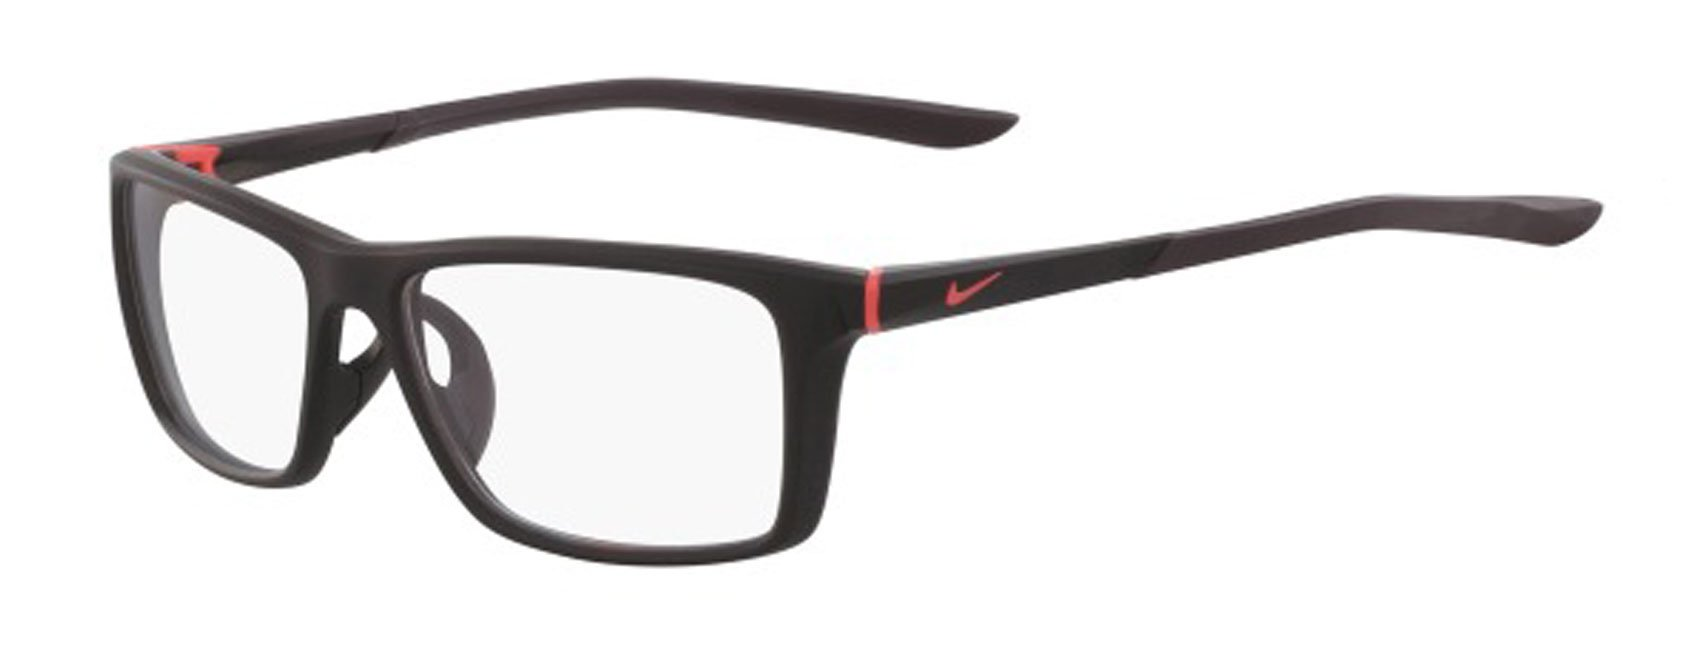 Nike Lead Glasses Matte Black 7084-01